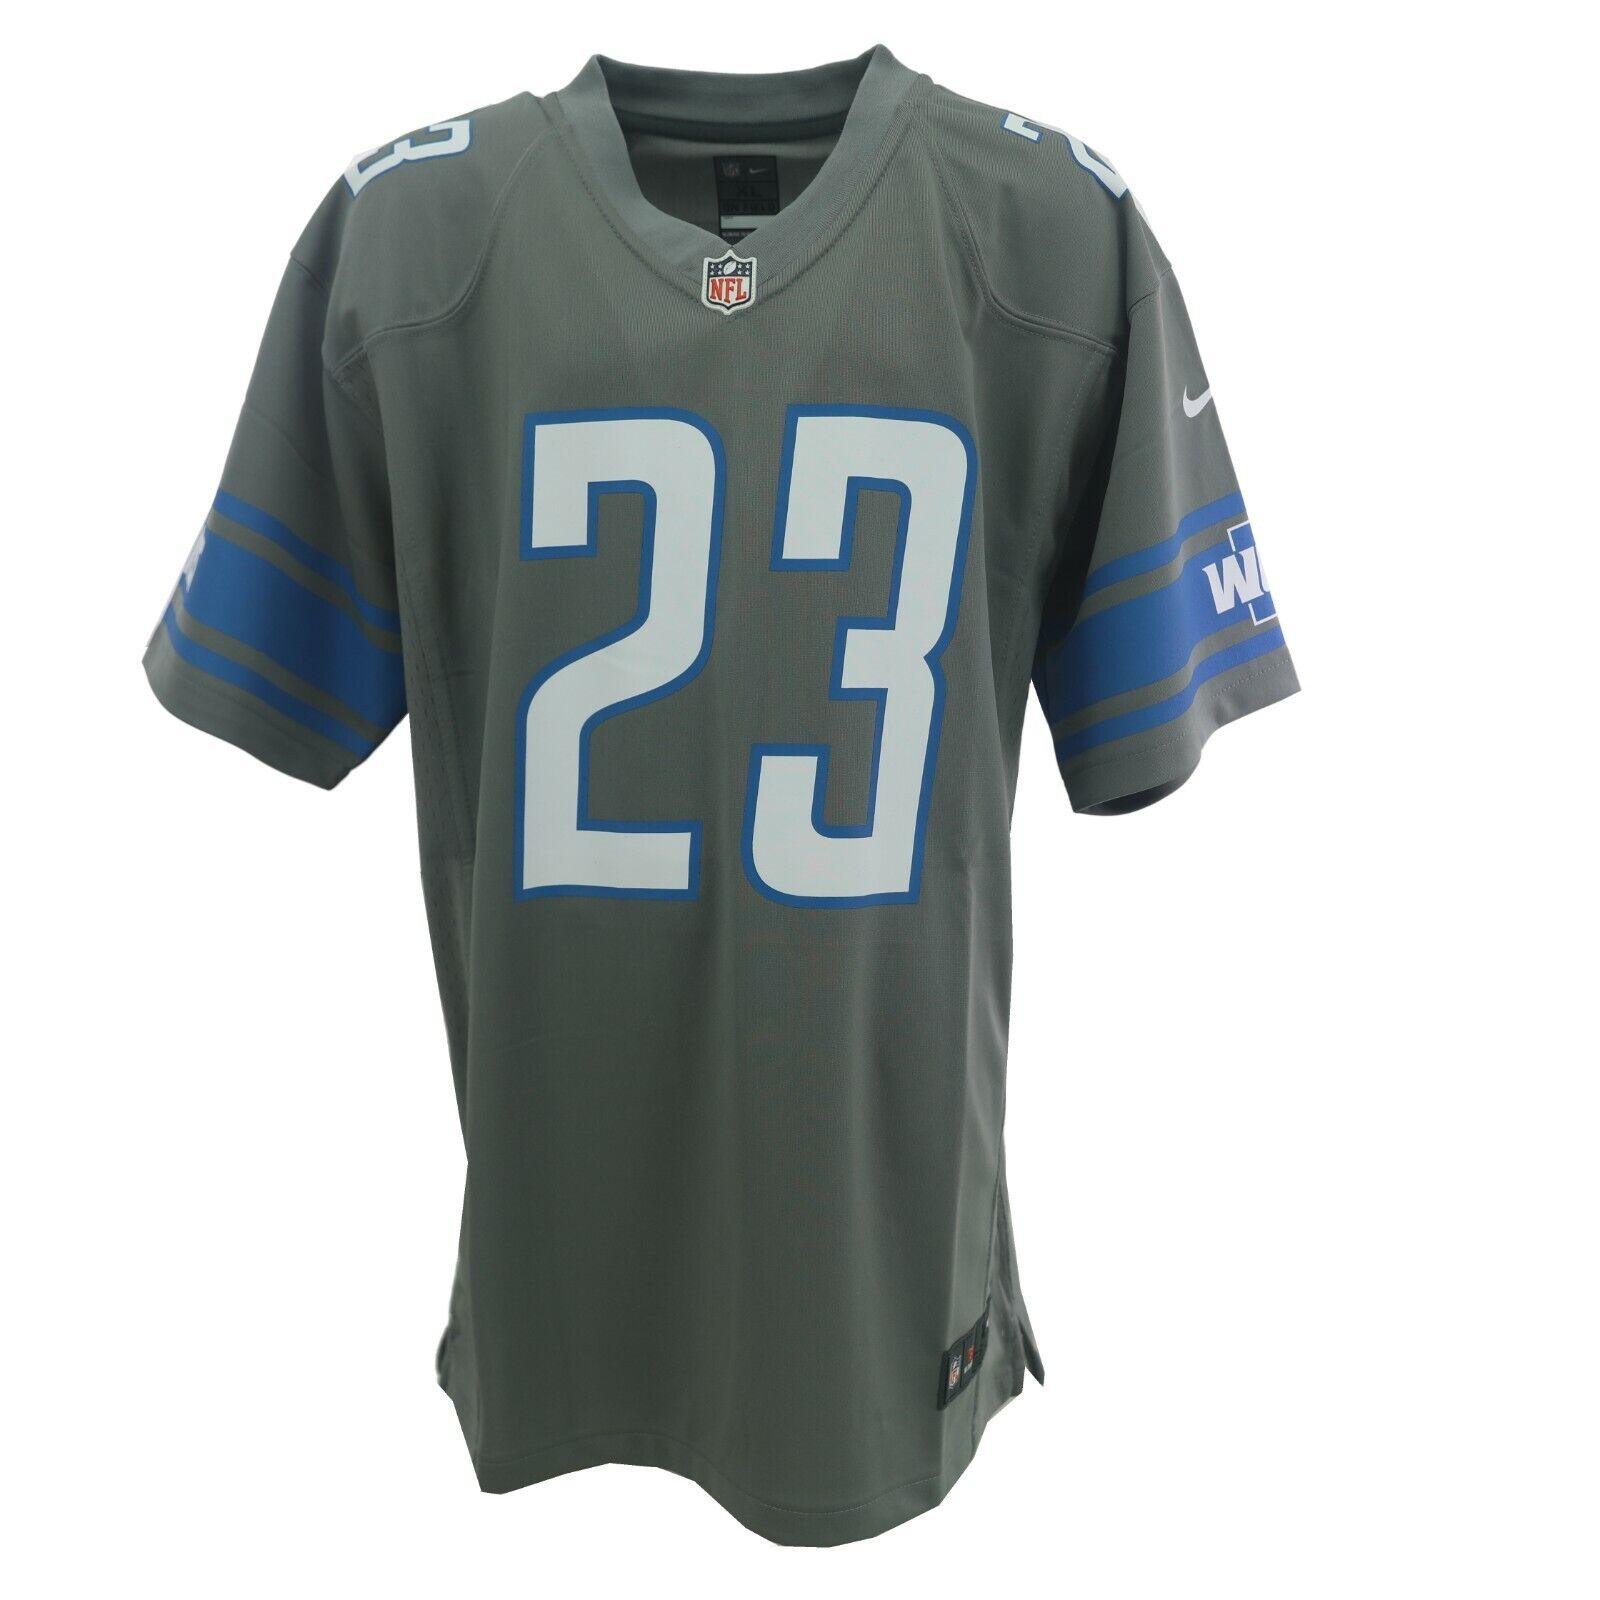 Detroit Lions Darius Slay Jr Official NFL Nike Kids Youth Size ...